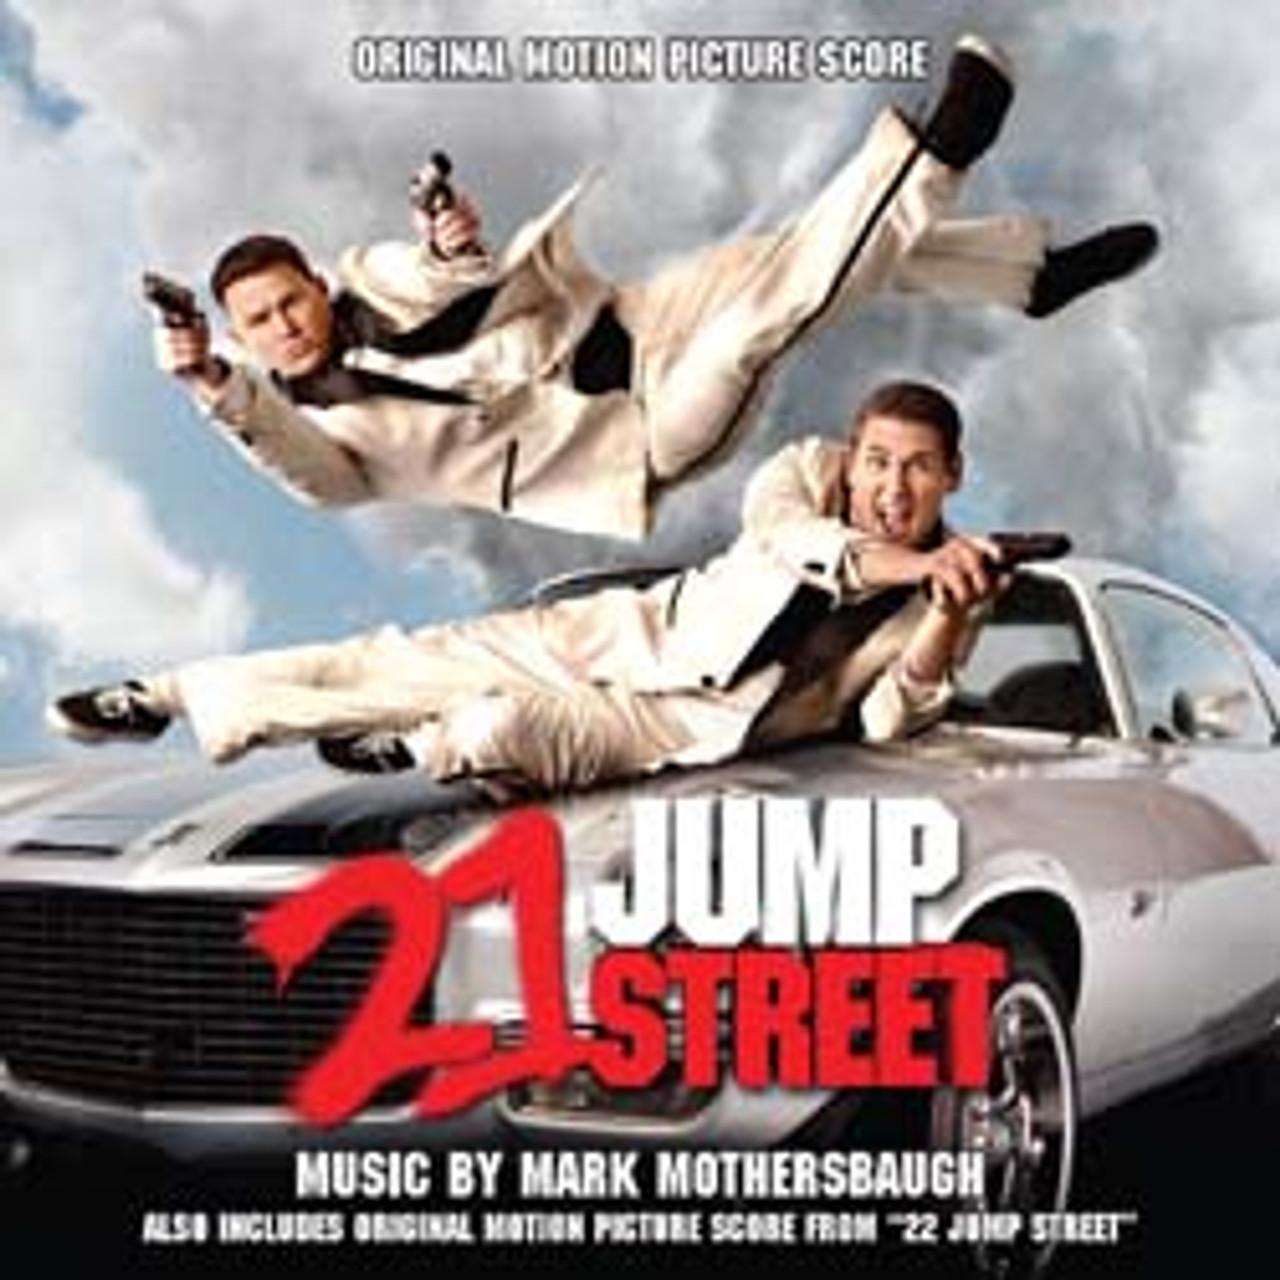 22 21 Jump Street Limited Edition 2 Cd Set La La Land Records